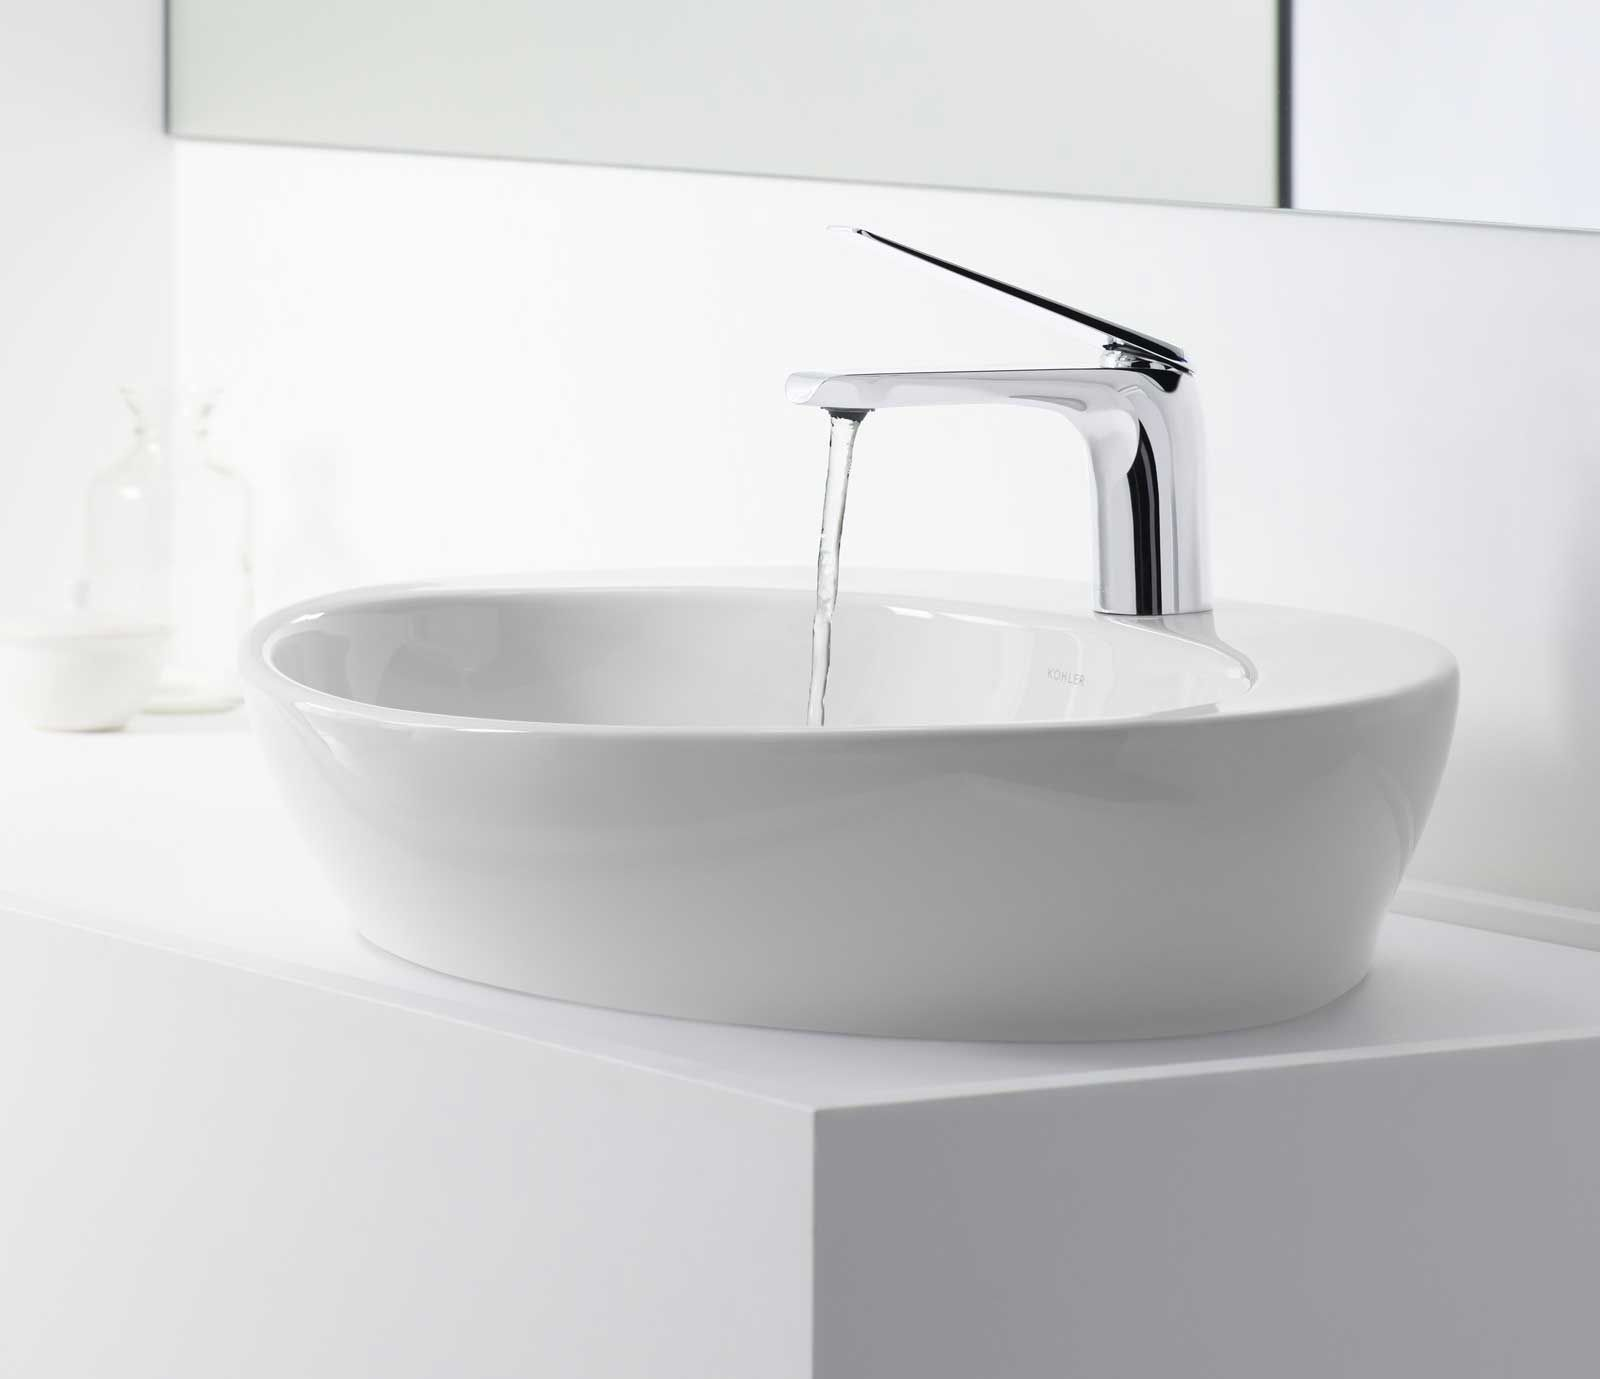 22 Famous Kohler Bathroom Sinks Ceplukan Elegant Bathroom Sink Kohler Bathroom